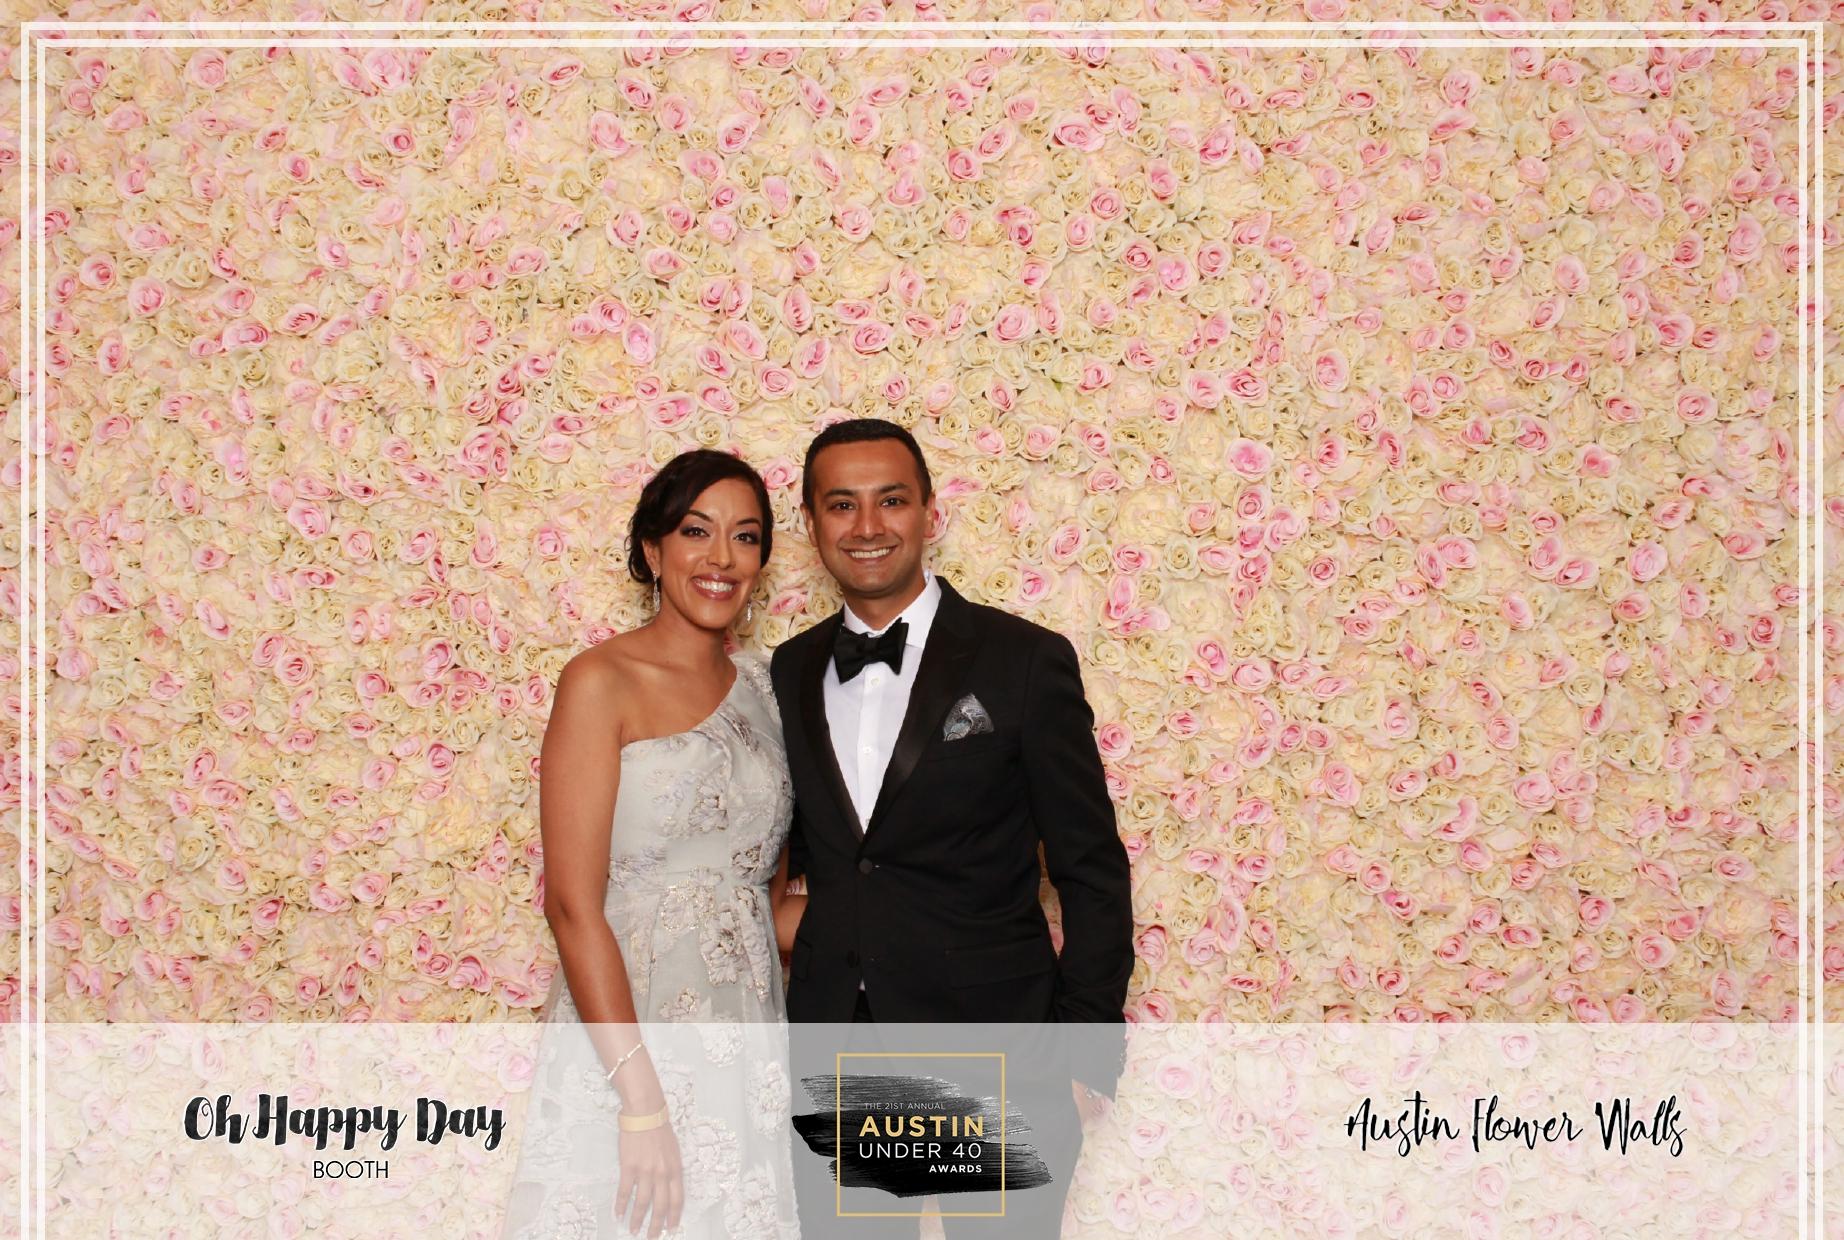 Oh Happy Day Booth - Austin Under 40-47.jpg